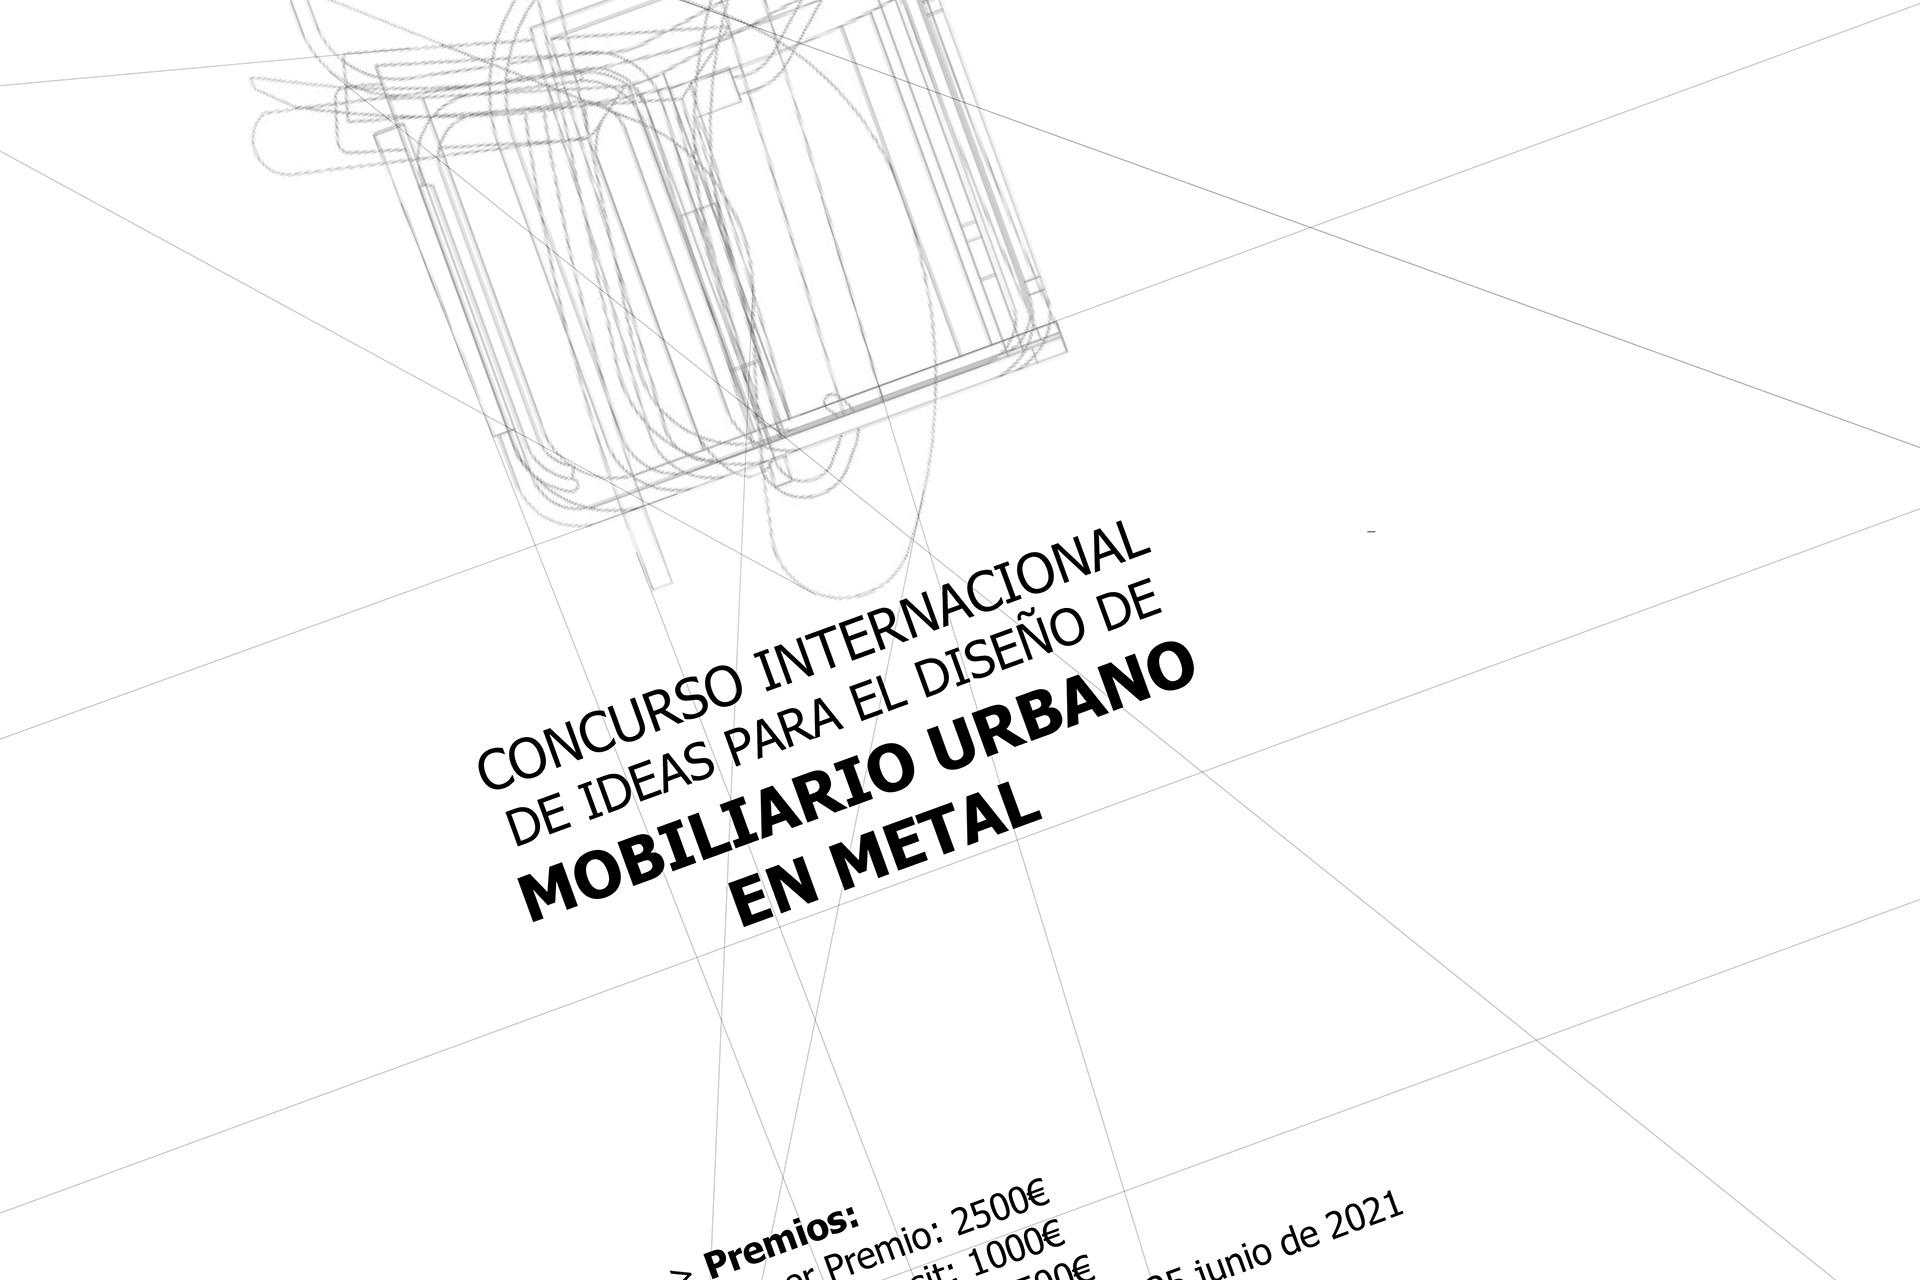 FernandoMoraga-usj-concurso-mobiliario-urbano